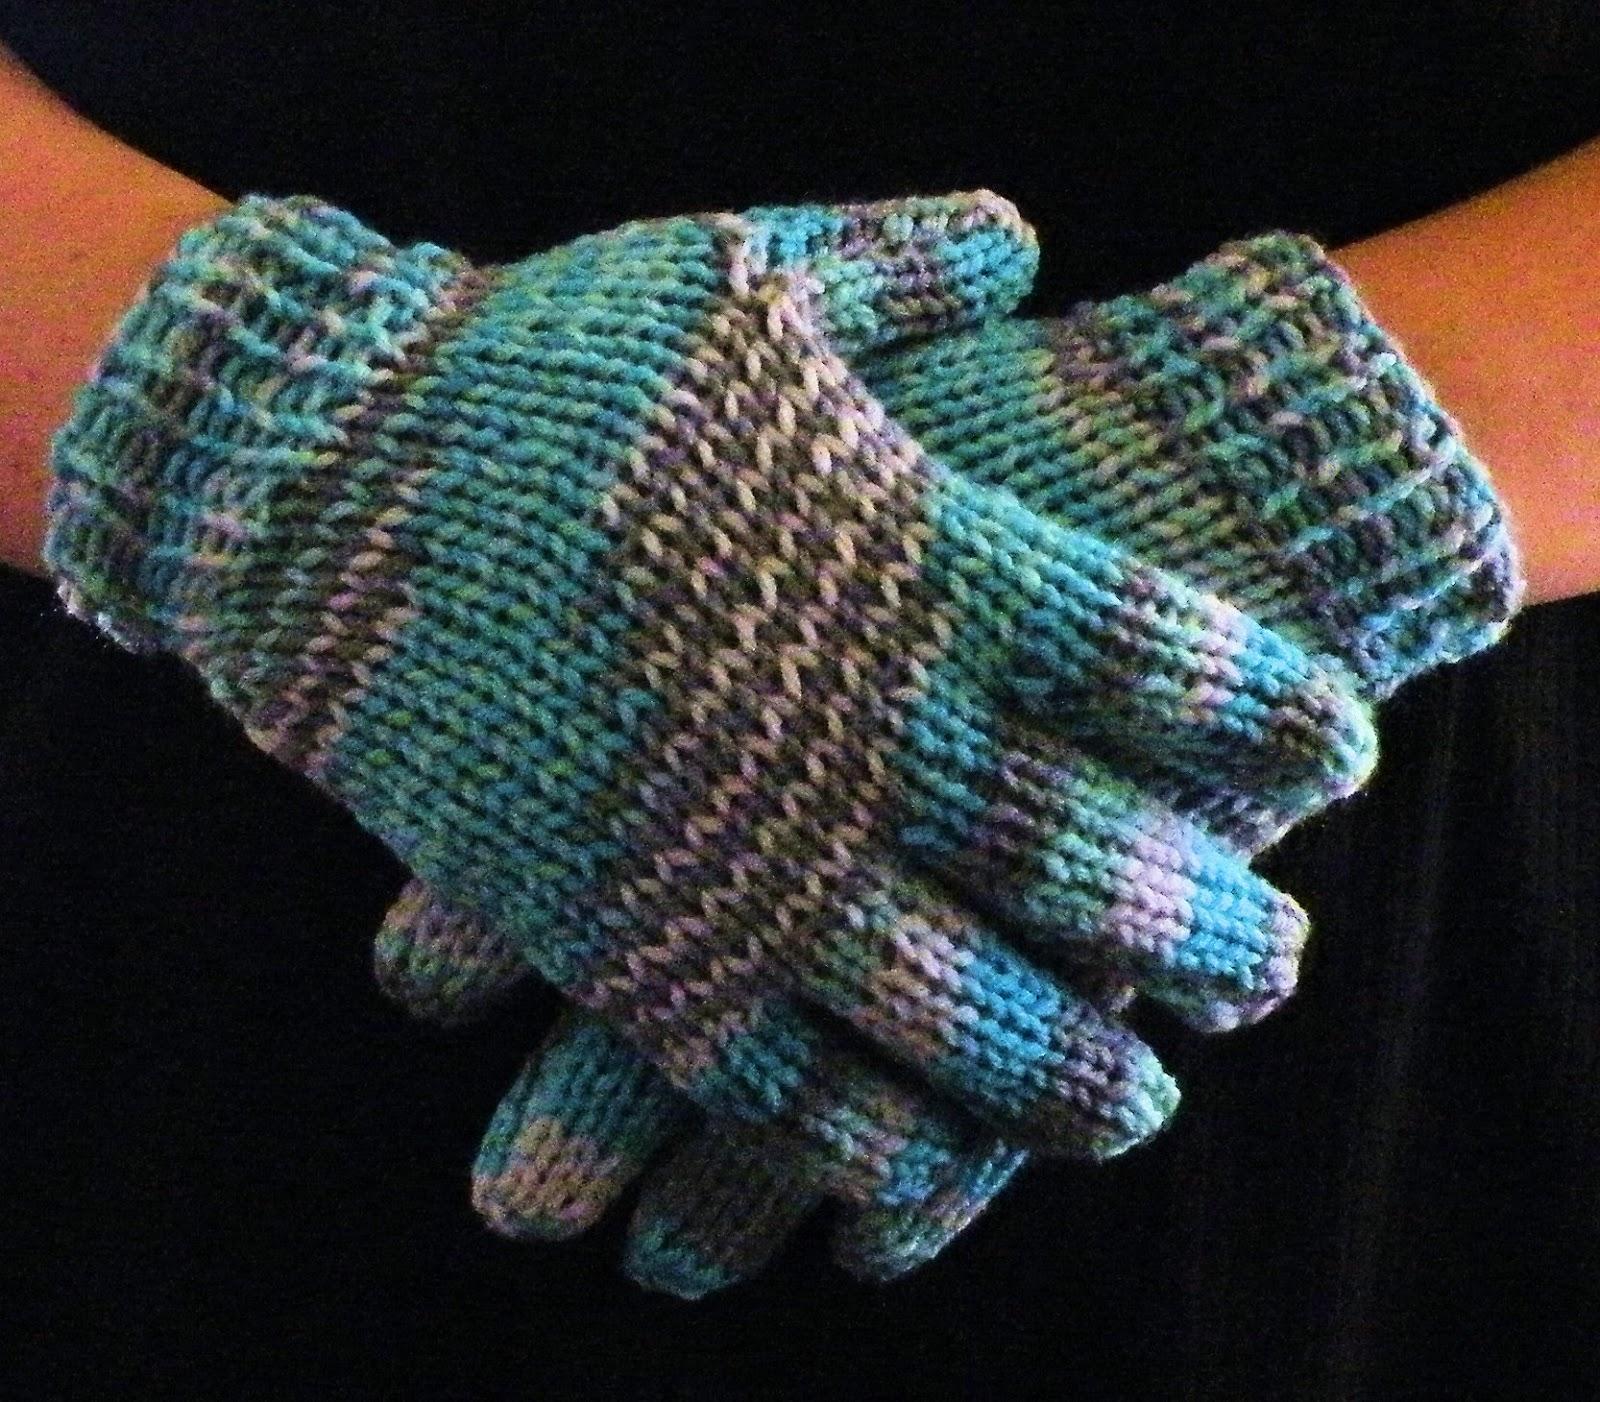 Knitting In The Heartland 2015 : Premium knitting looms by cindwood crafts loom yarn